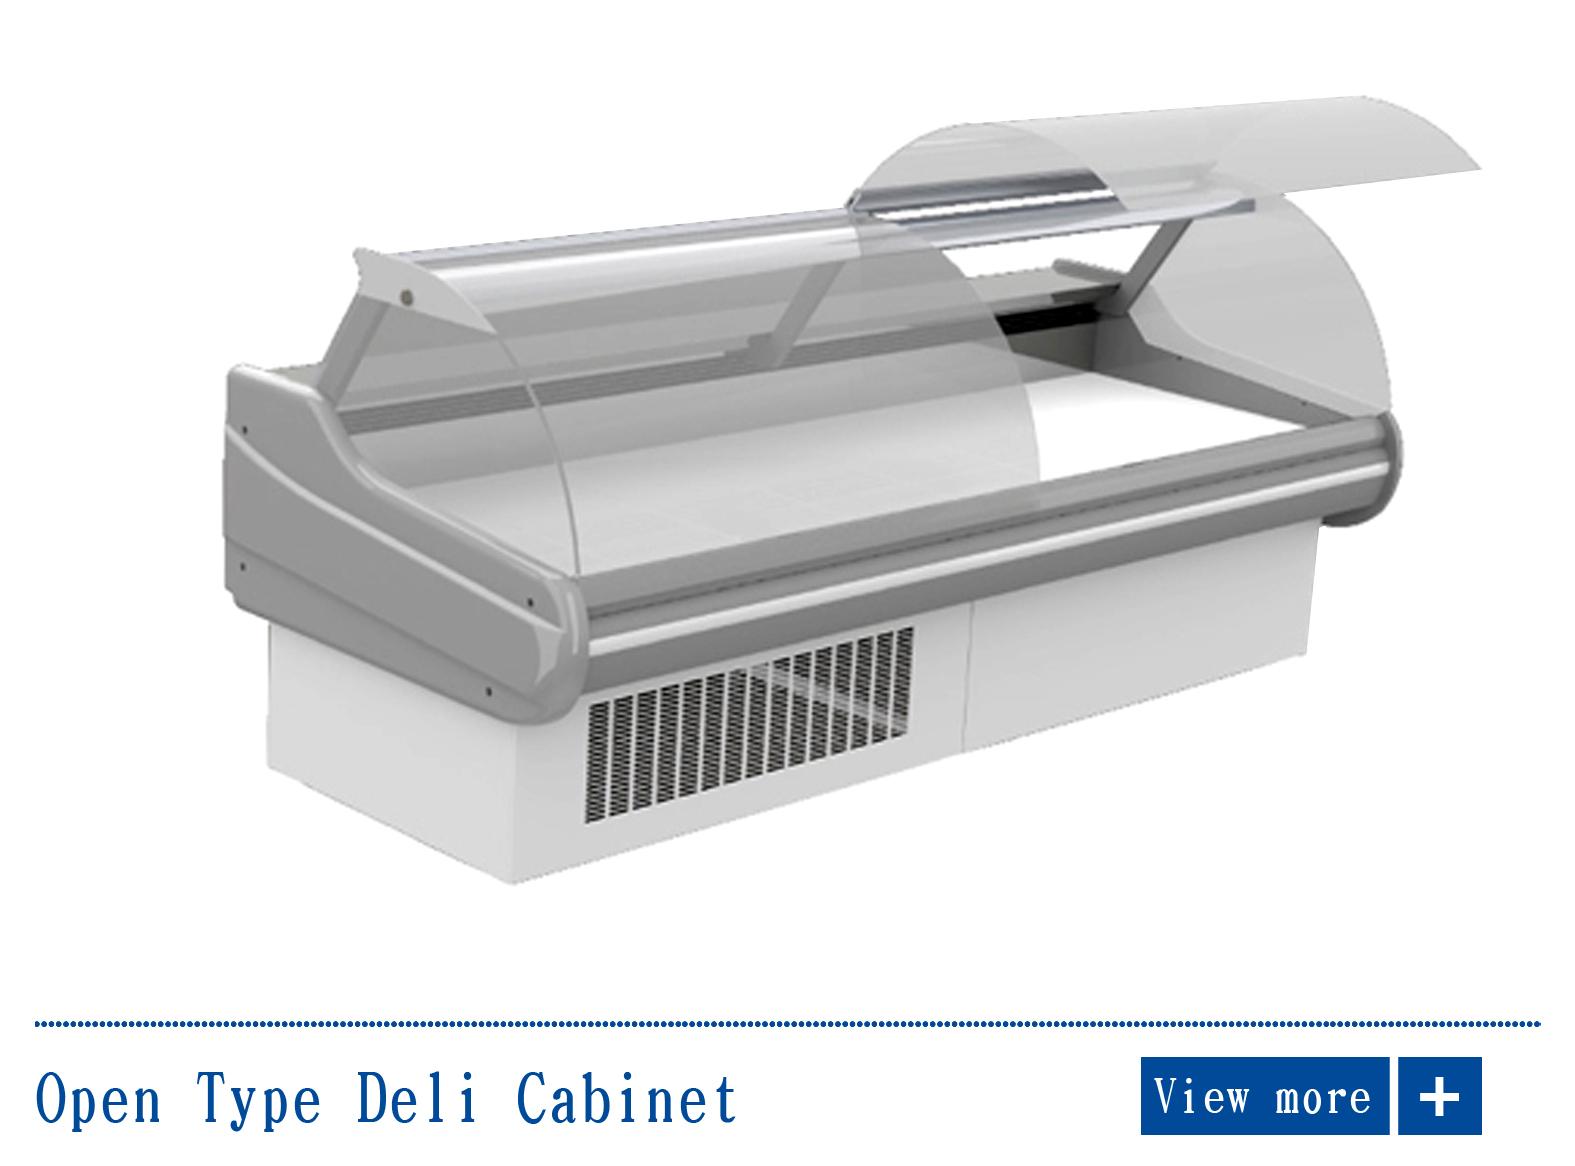 Open Type Deli Cabinet